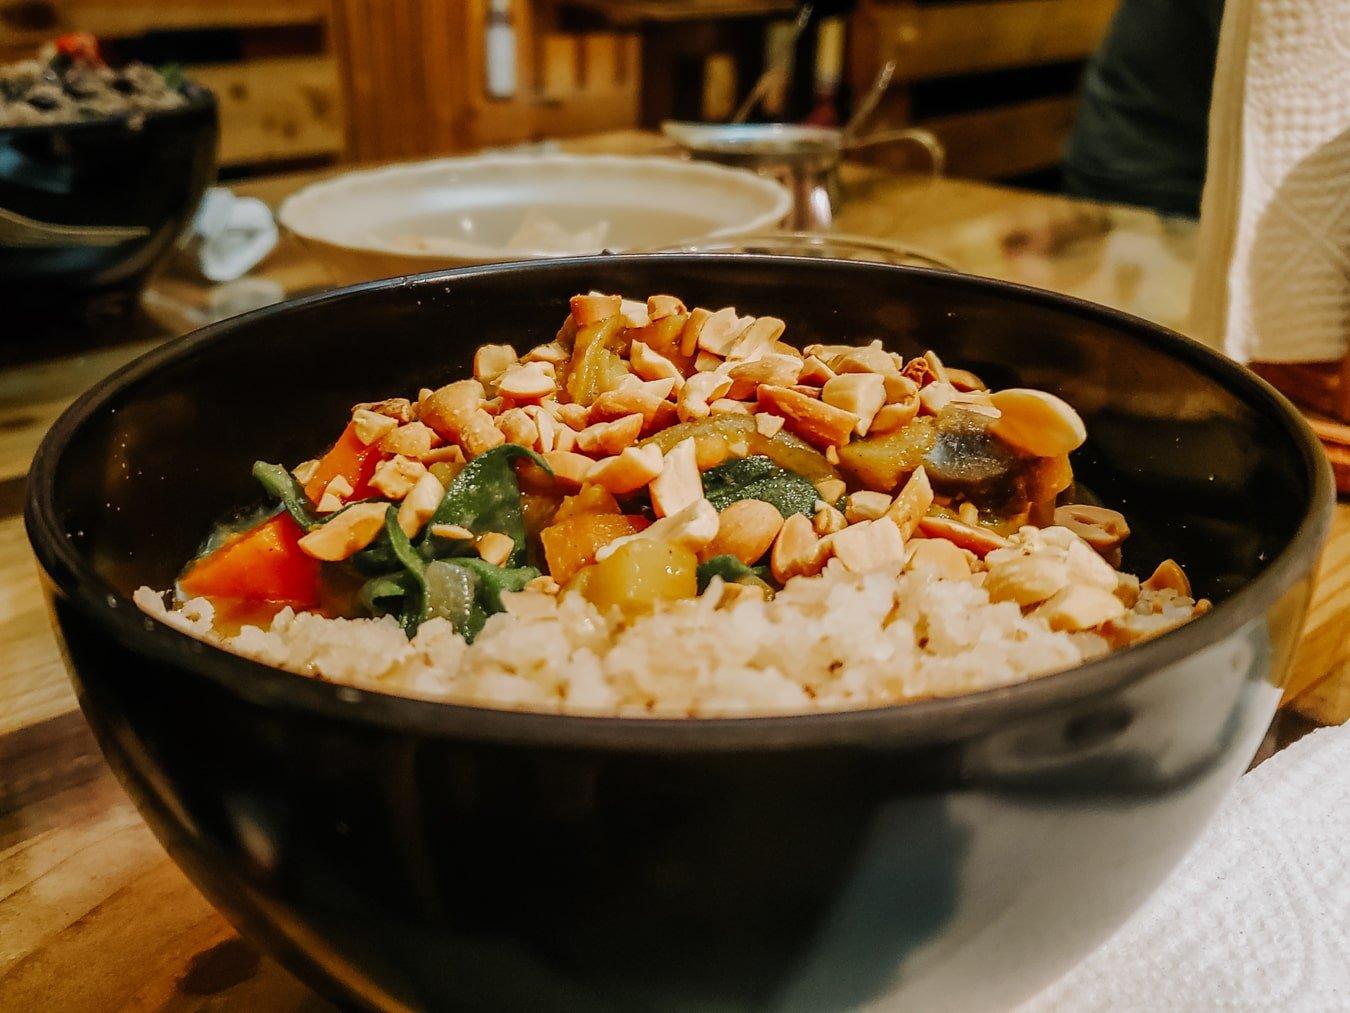 vegan curry bowl at bek semilla de vida restaurant in san cristobal de las casas, chiapas mexico